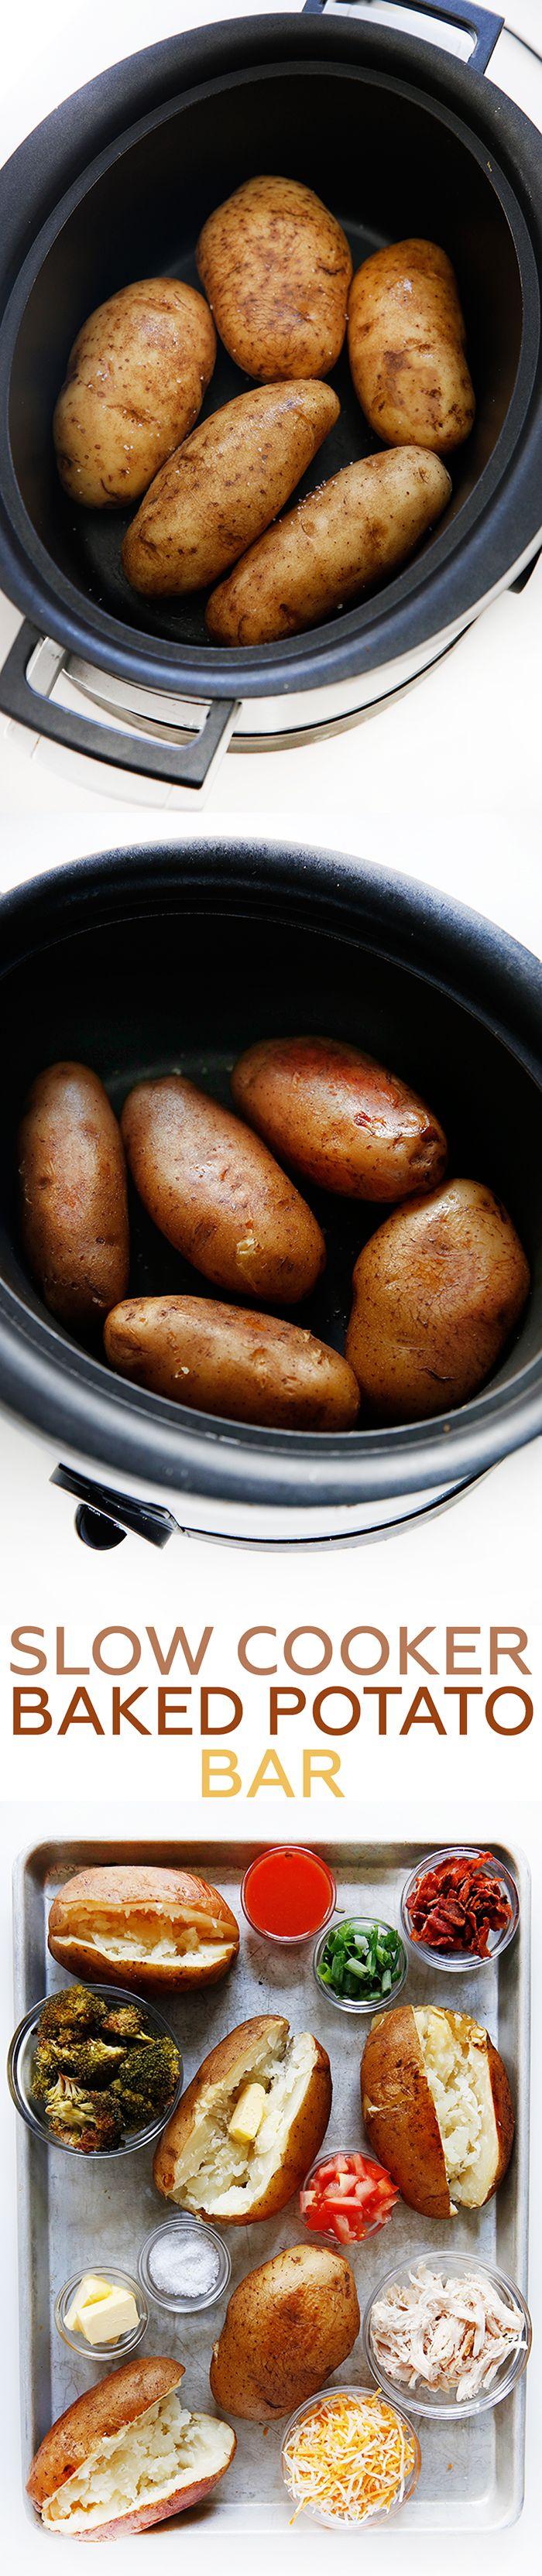 Slow Cooker Baked Potato Bar - Lexi's Clean Kitchen